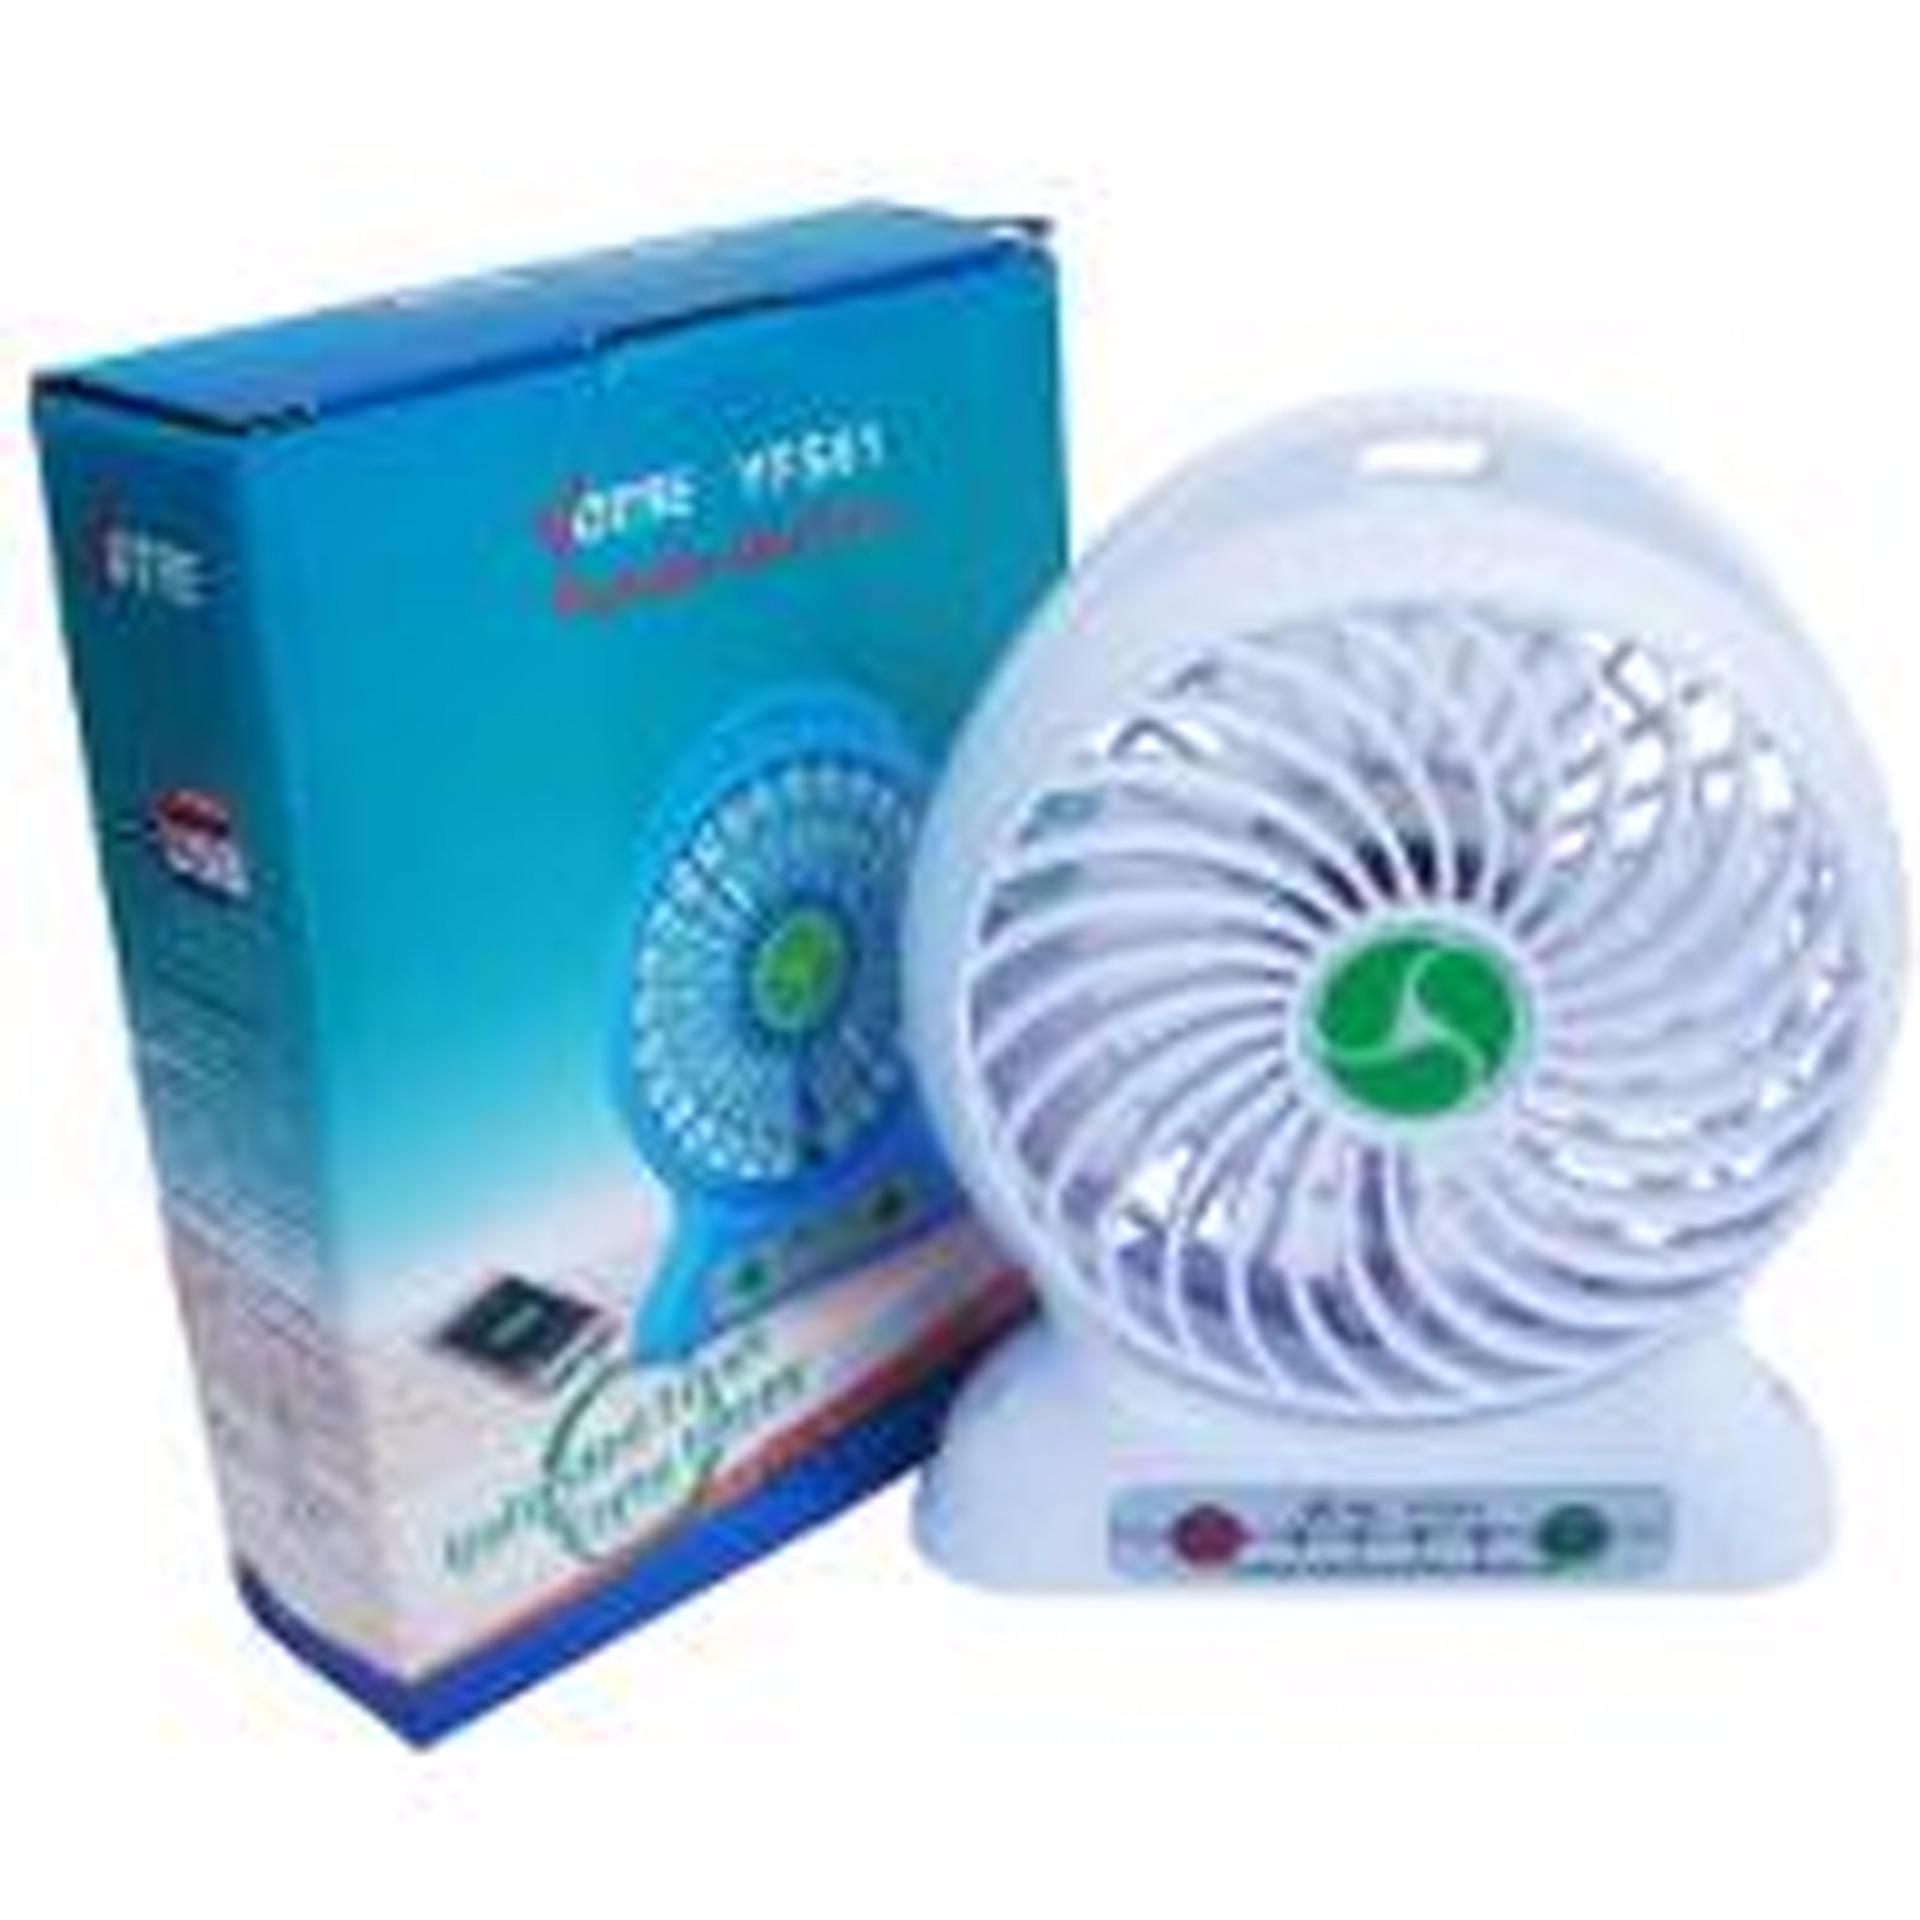 Diskon Penjualan Kipas Angin Mini Portable Battery Fan Bisa Untuk Powerbank